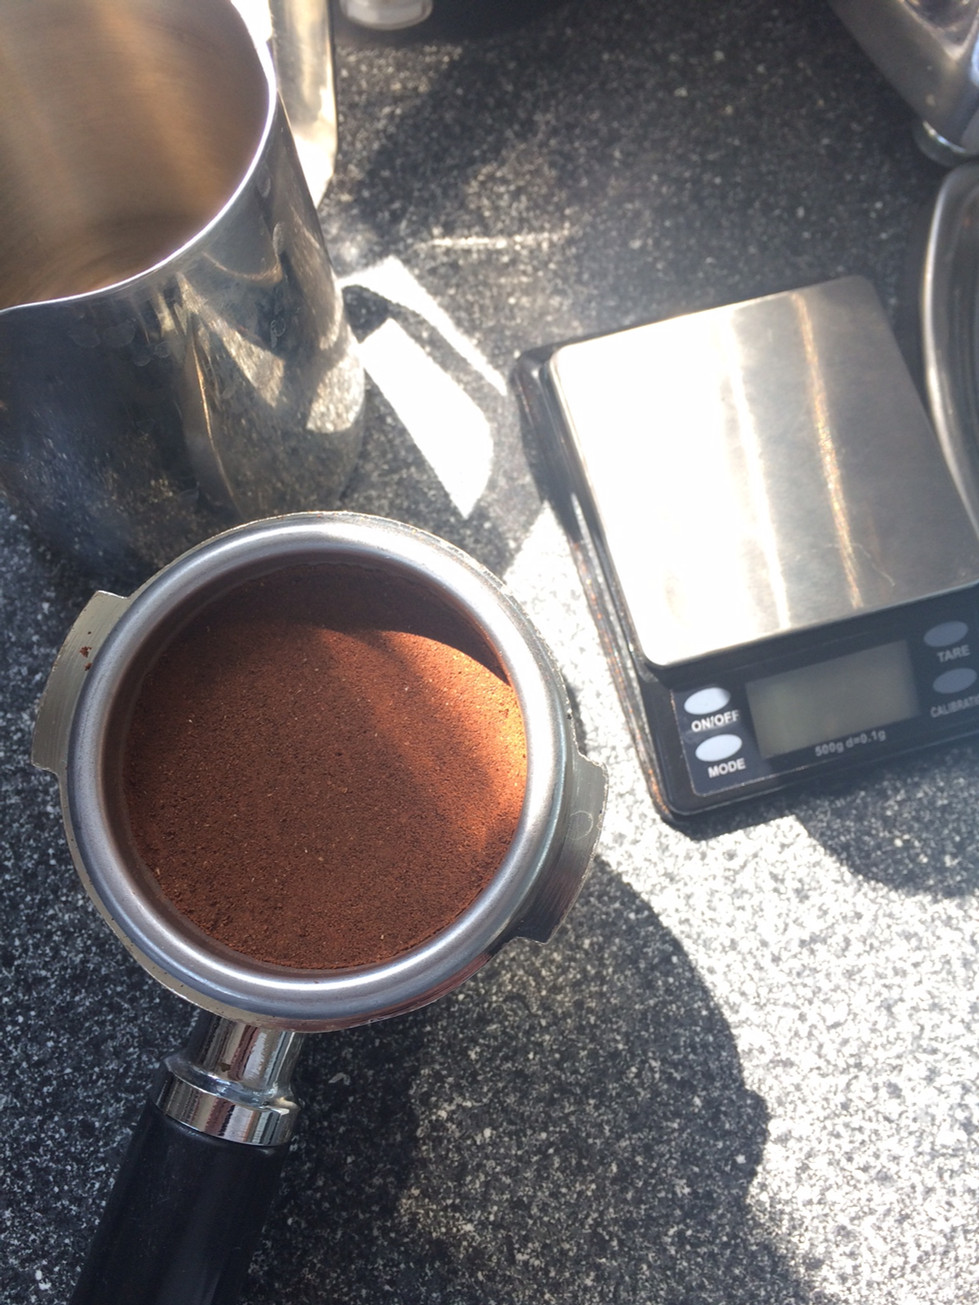 Espresso - Home guide